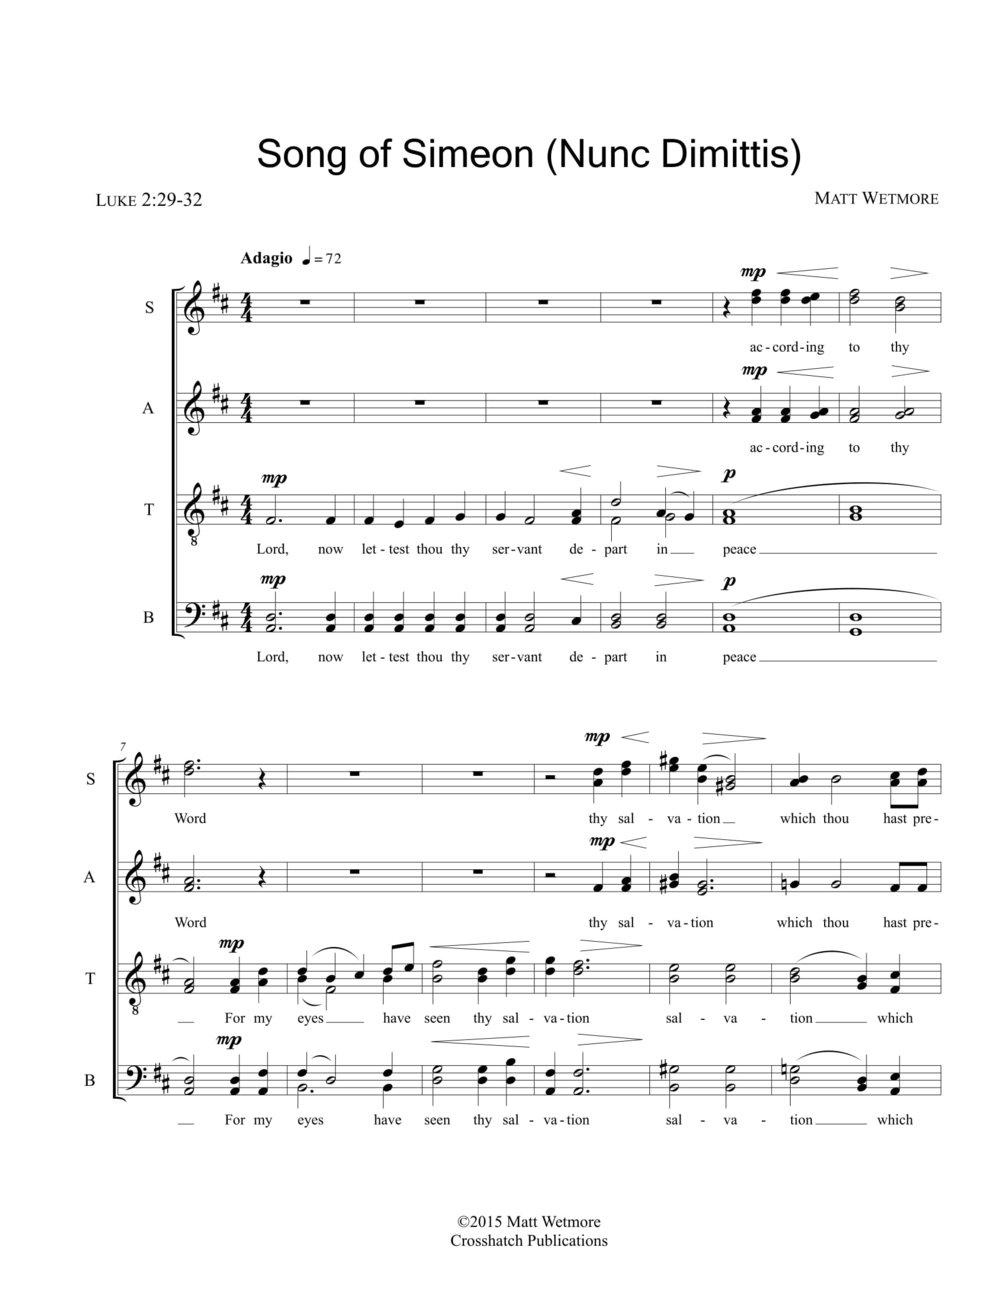 Song of Simeon-3.jpg